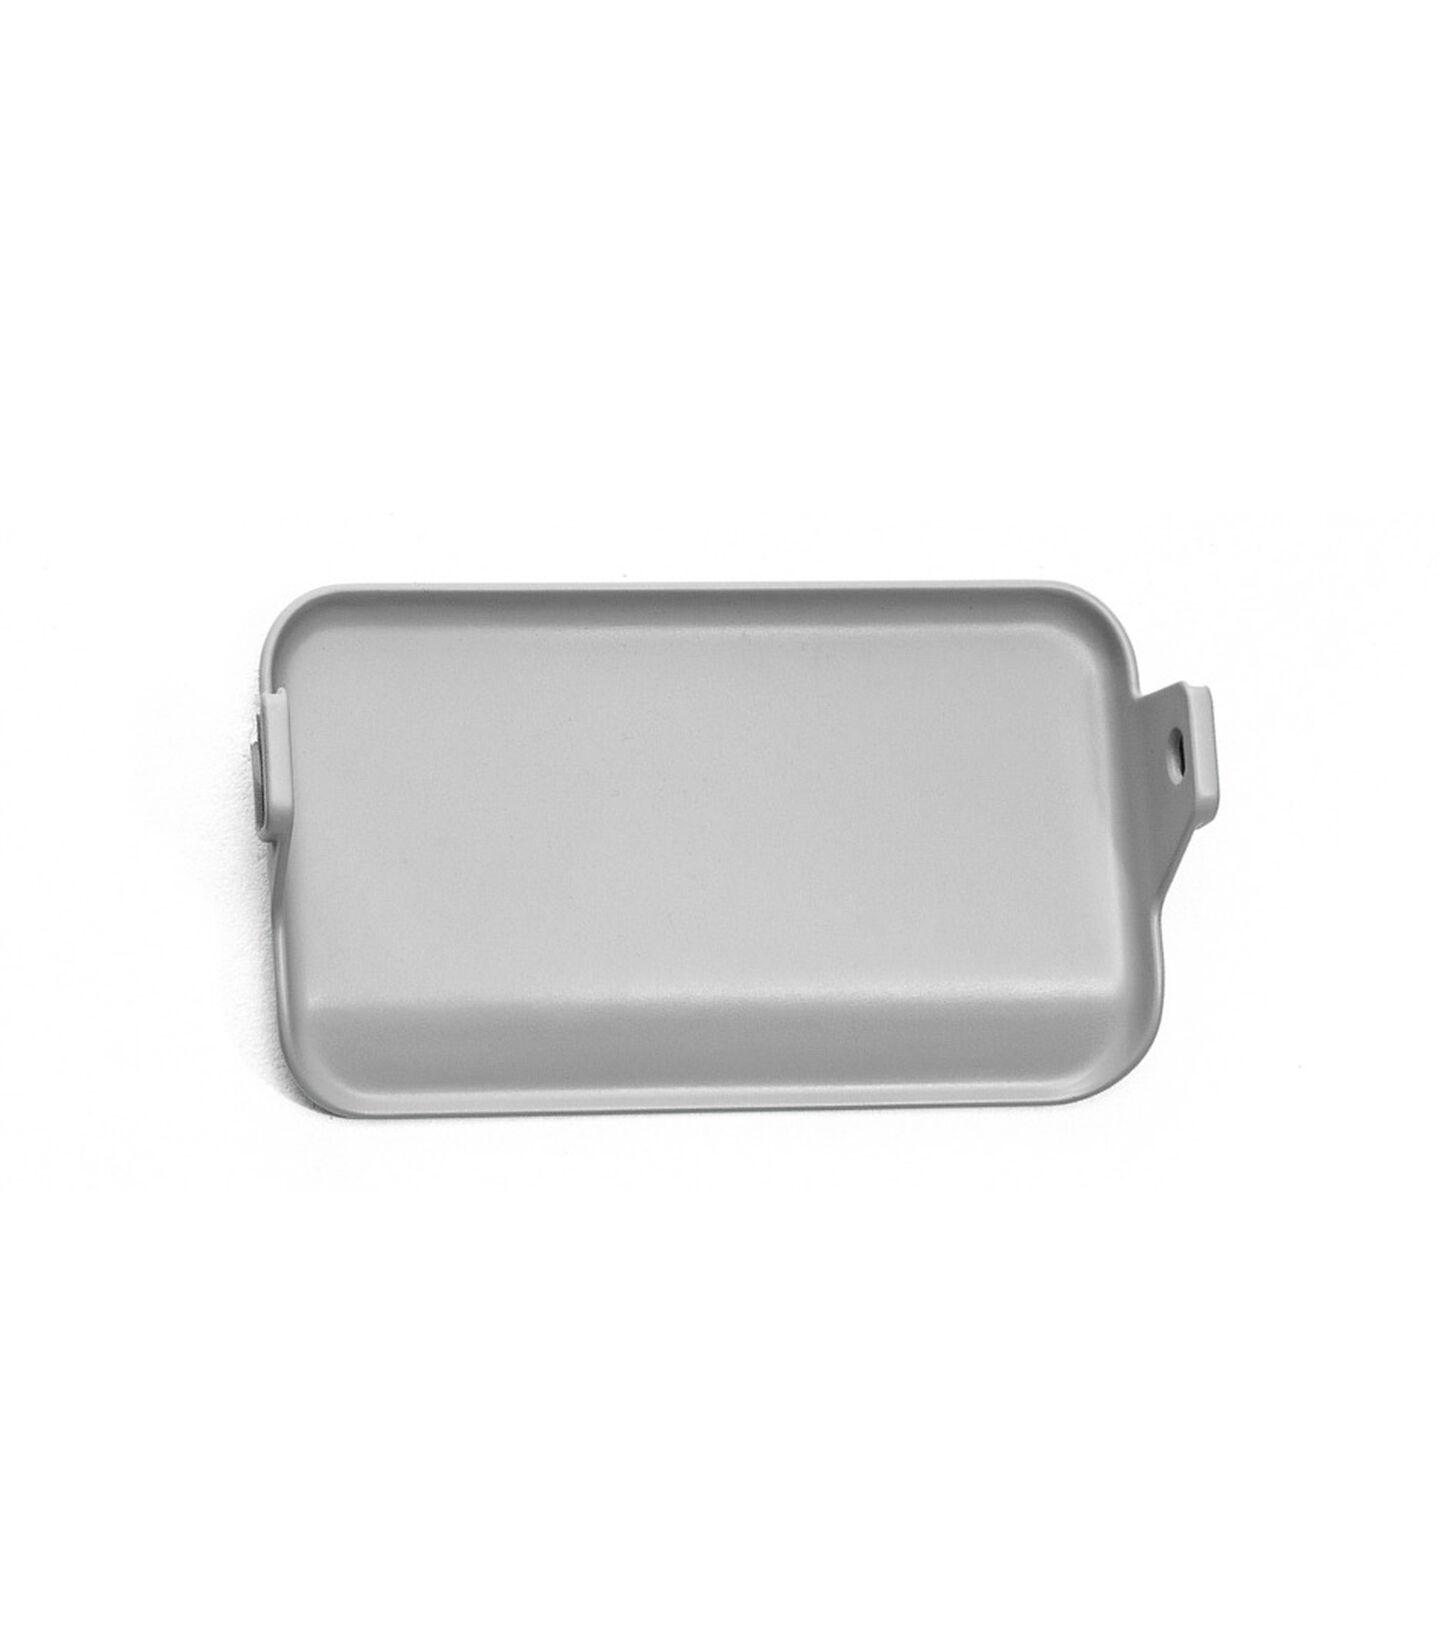 Stokke® Clikk™ Pedana Cloud Grey, Cloud Grey, mainview view 1